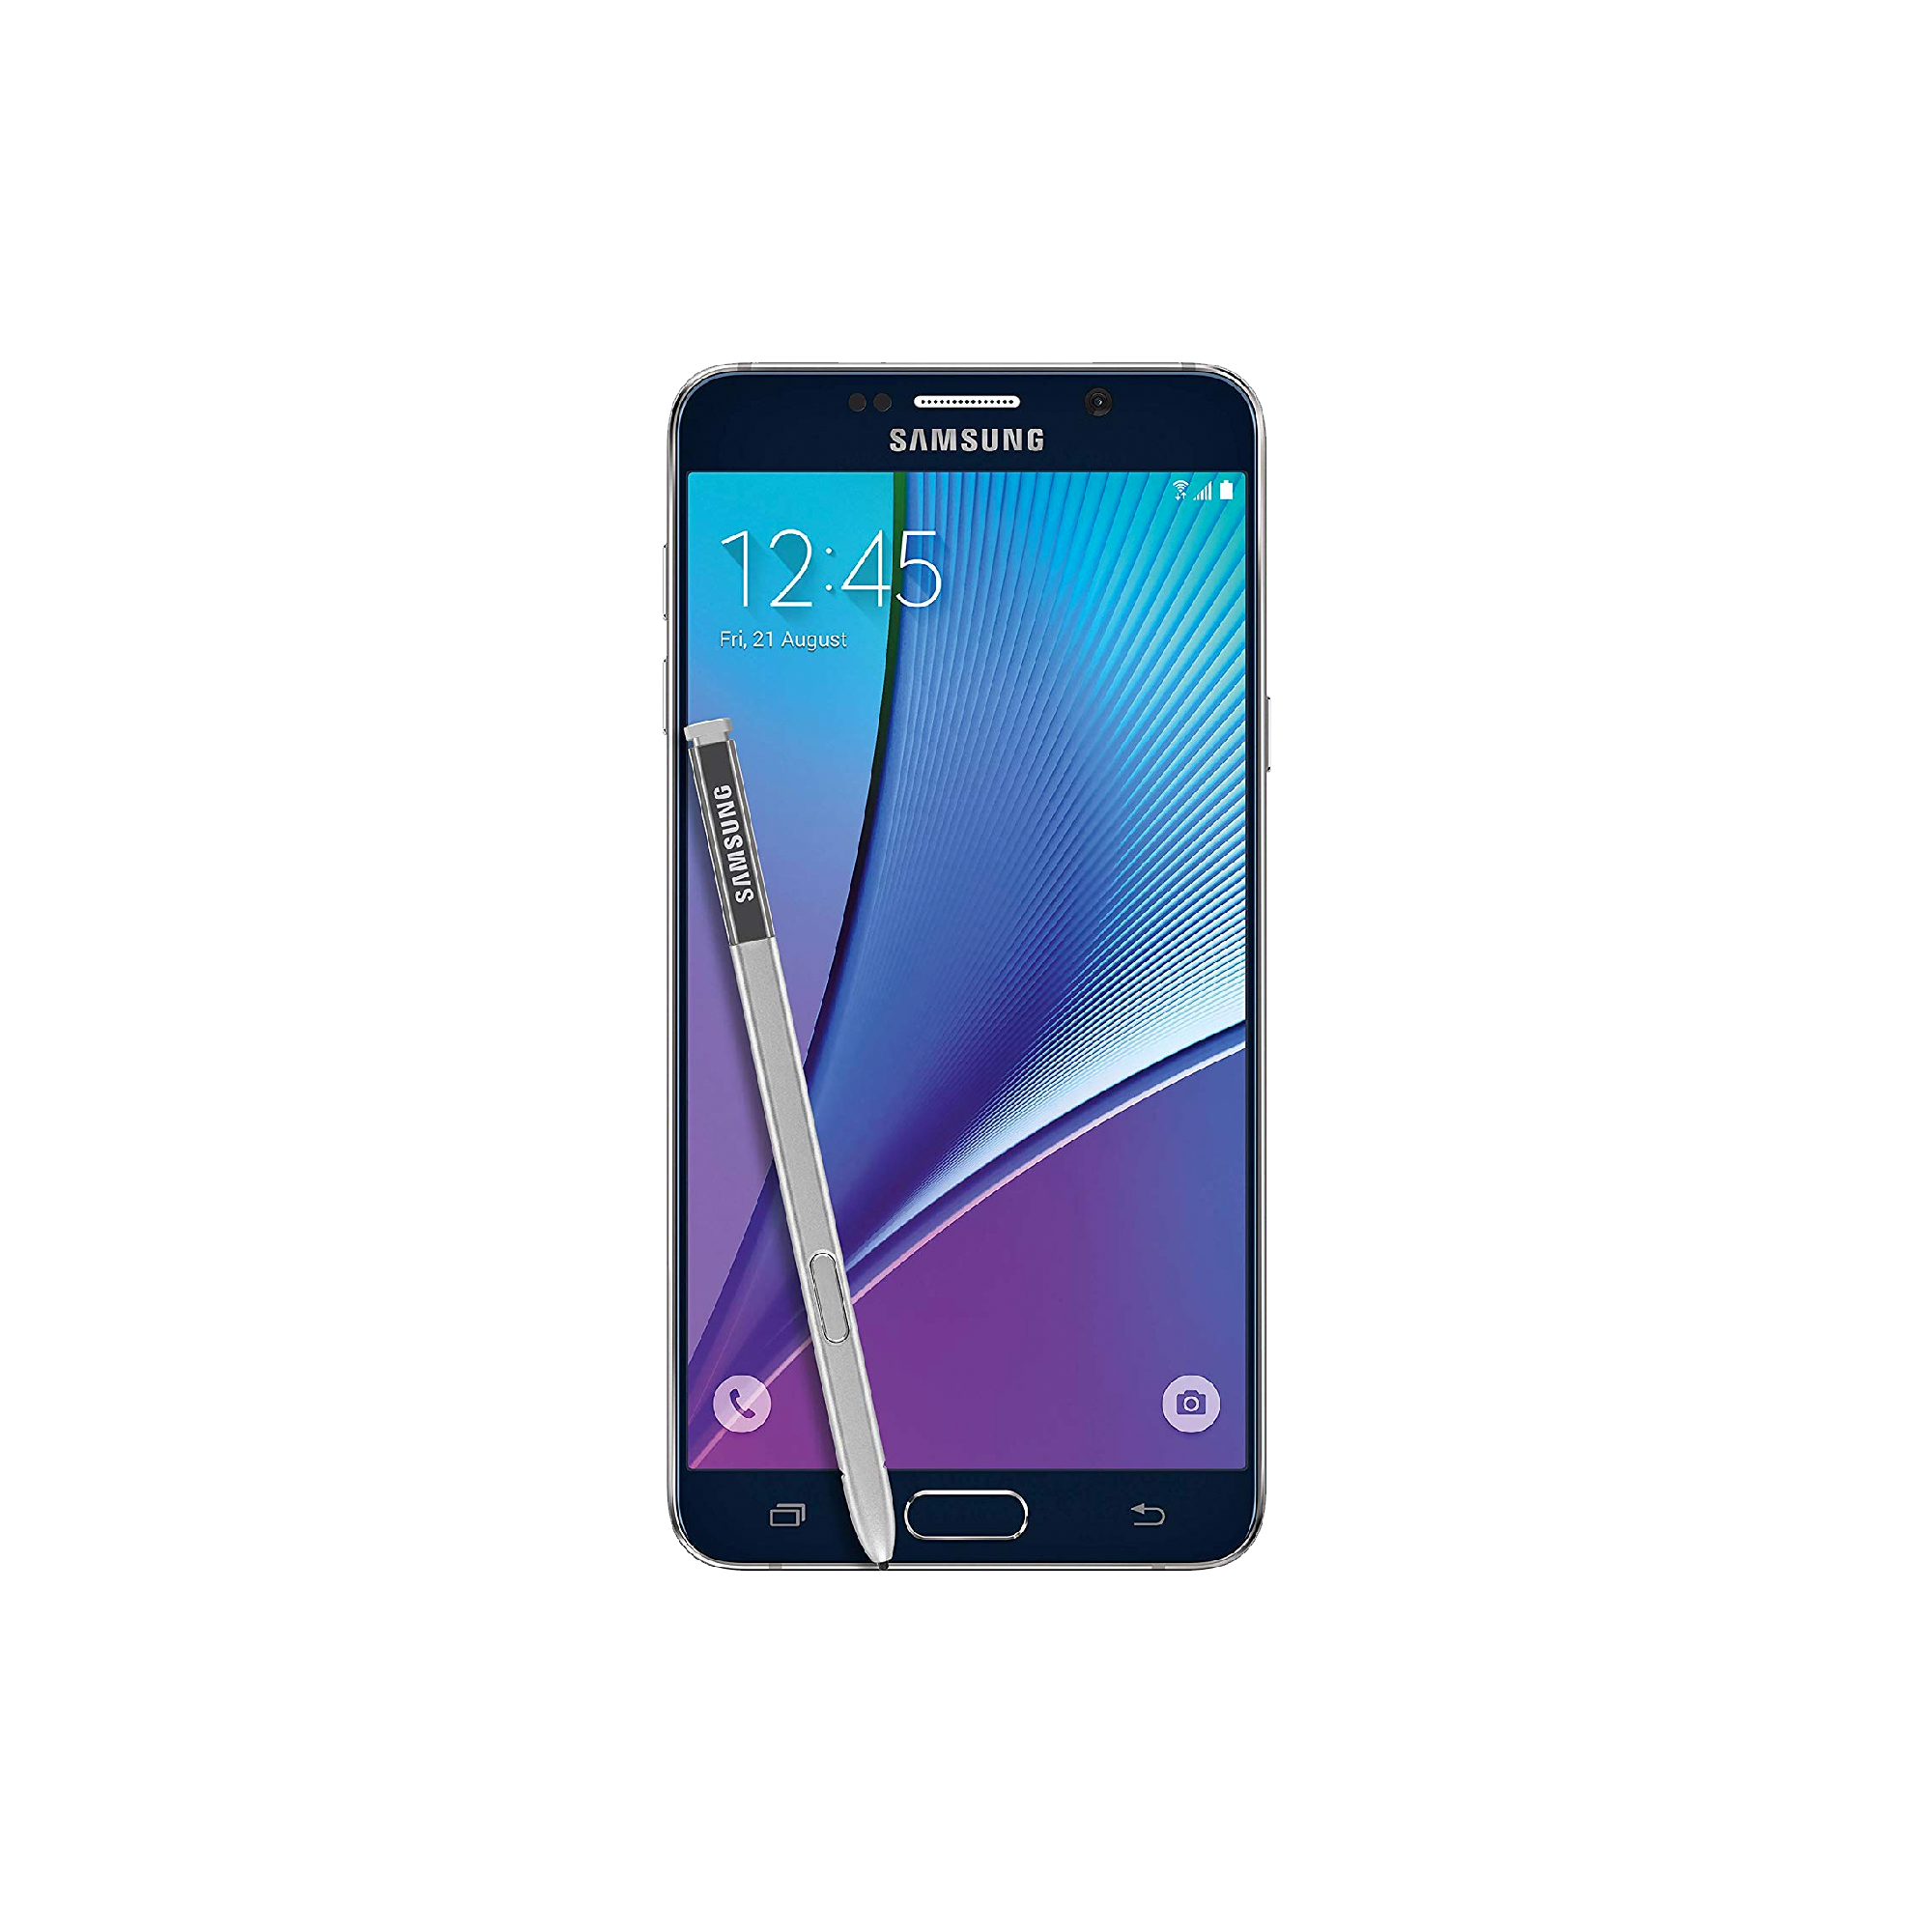 Samsung Note 5 | $220 + tax